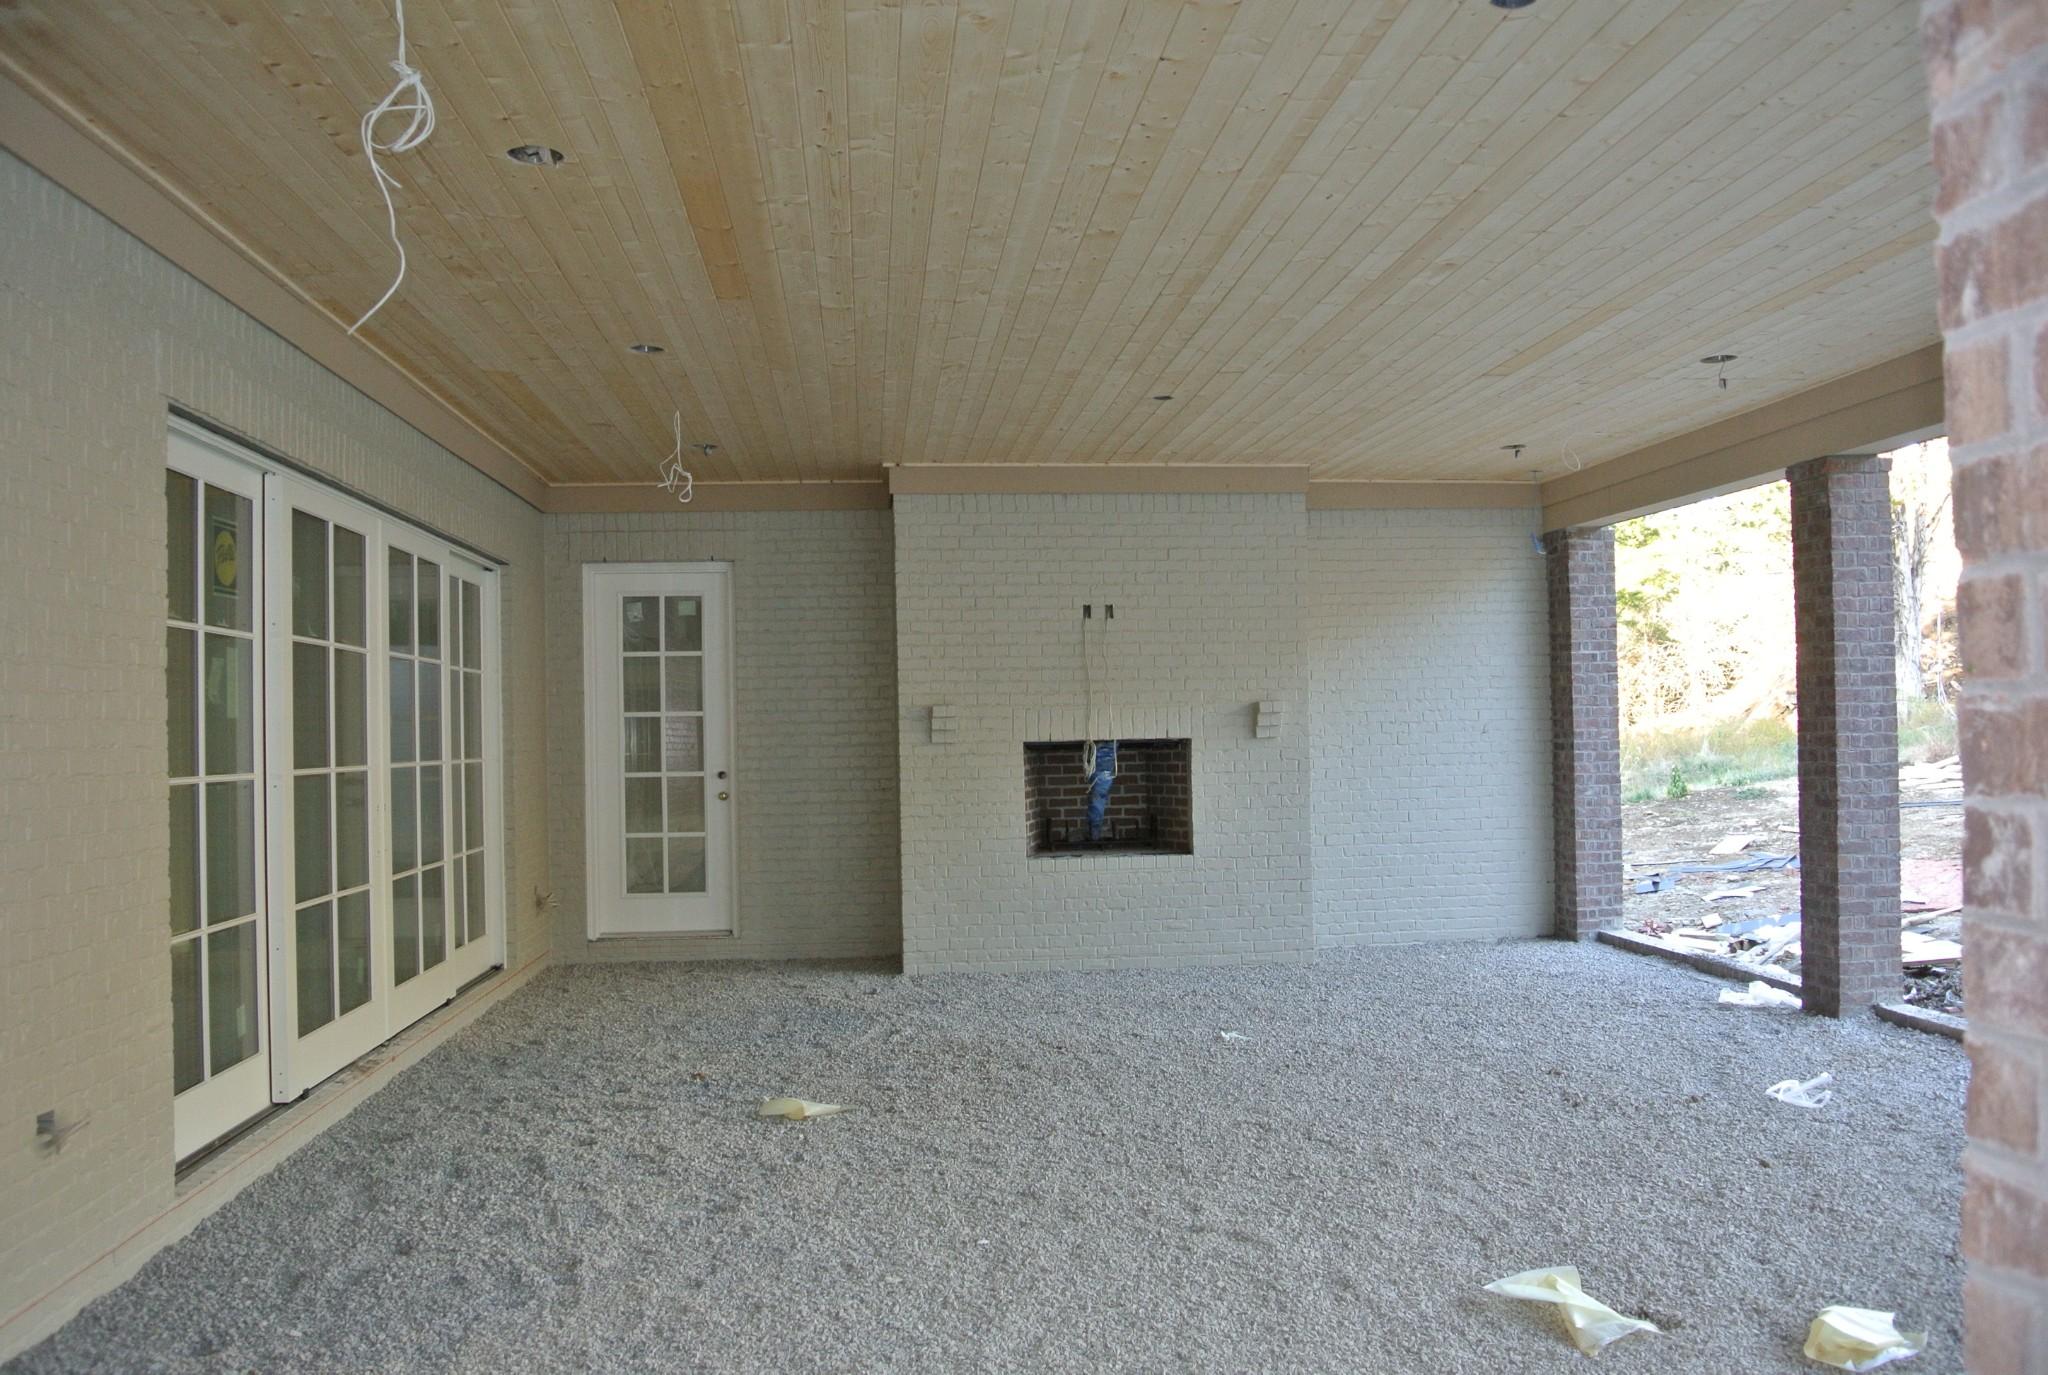 9246 Lehigh Drive (Lot #44), Brentwood, TN 37027 - Brentwood, TN real estate listing